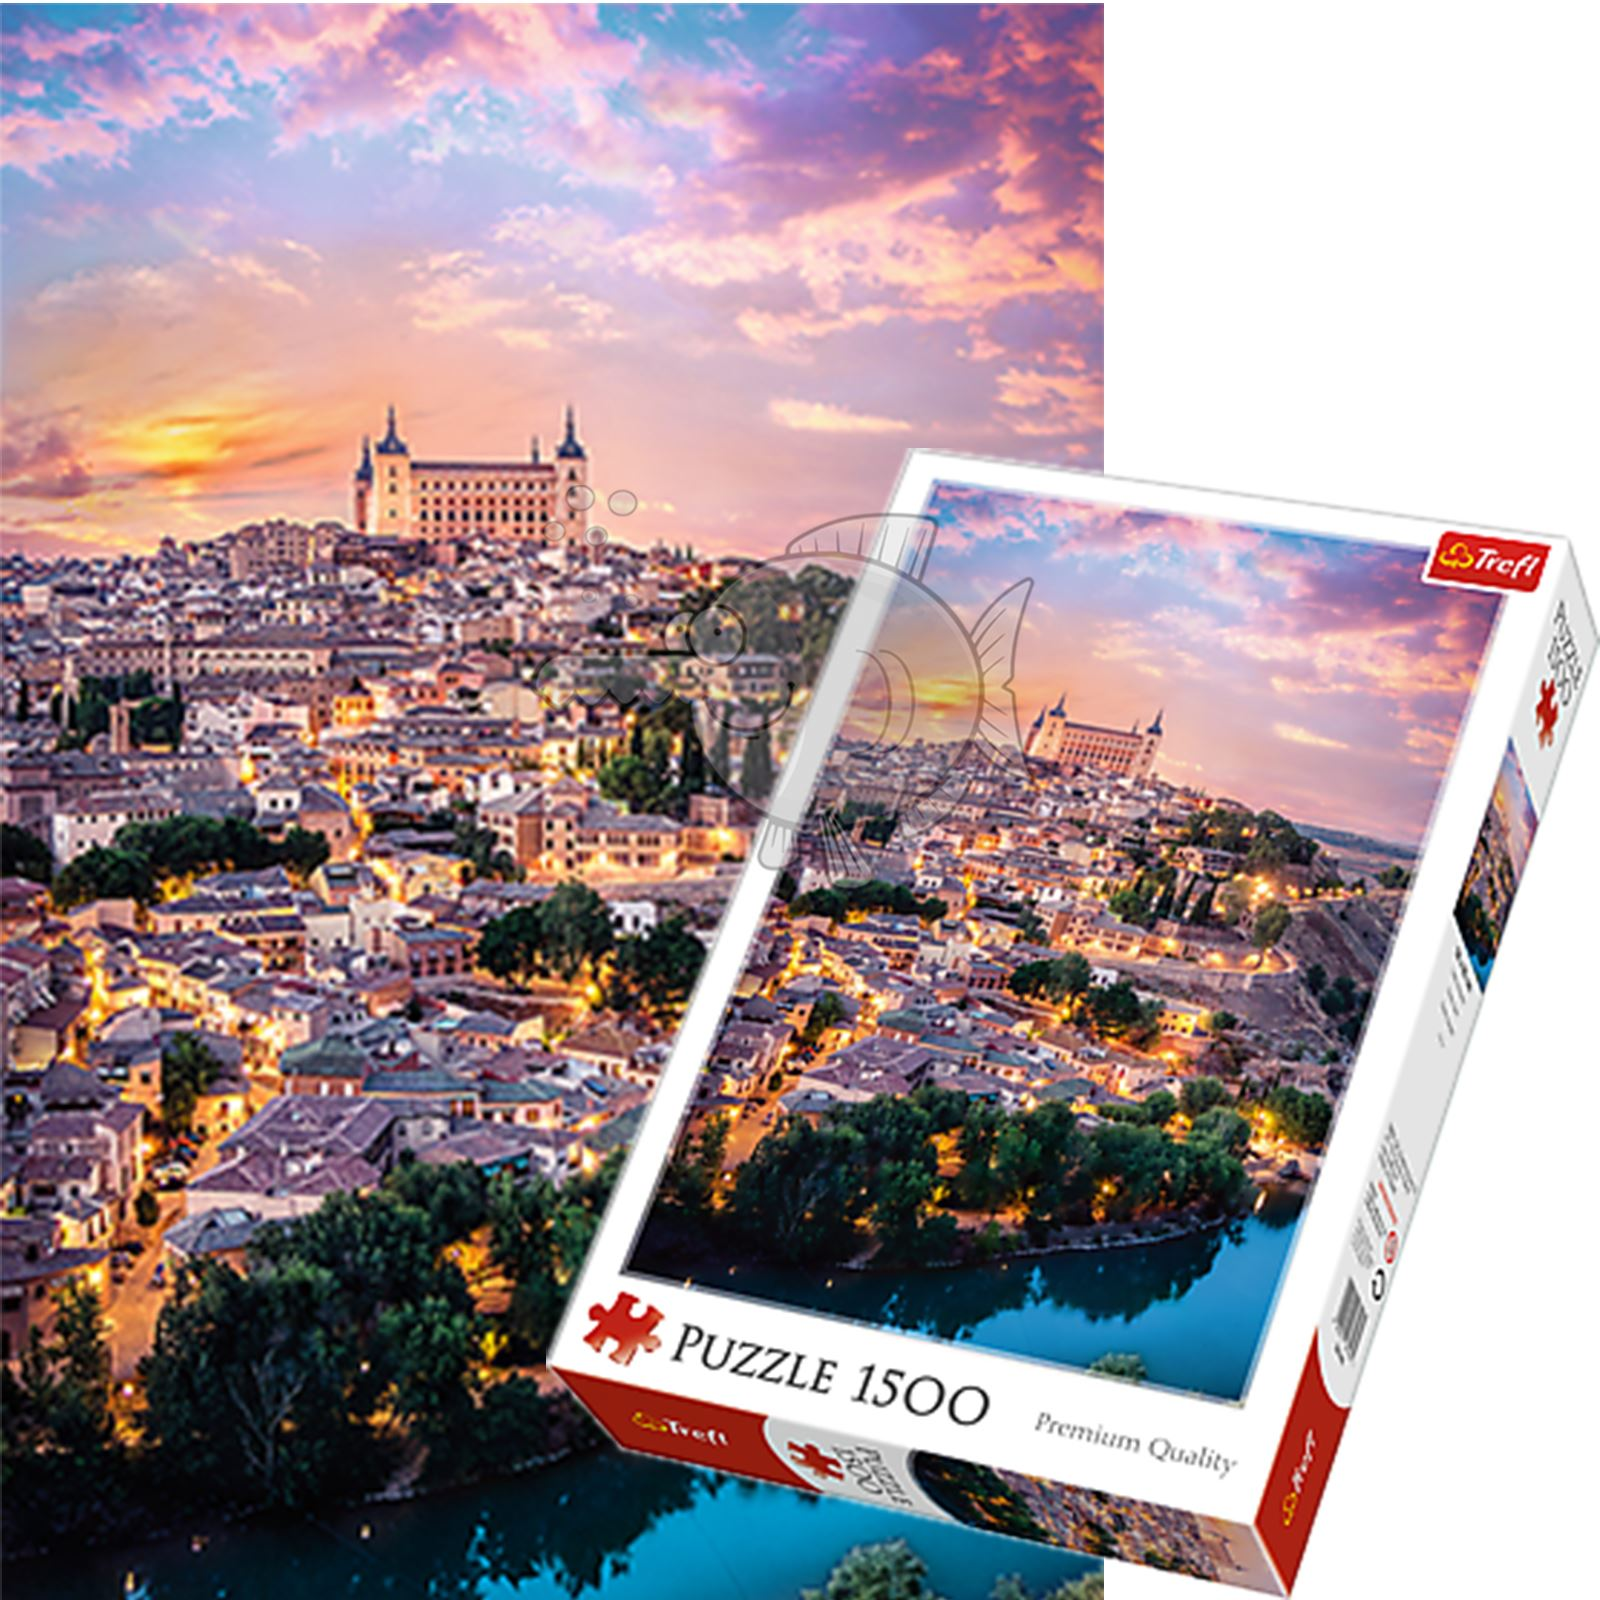 Trefl-300-500-1000-1500-2000-3000-4000-6000-Piece-Jigsaw-Puzzle-Landscapes-City thumbnail 422